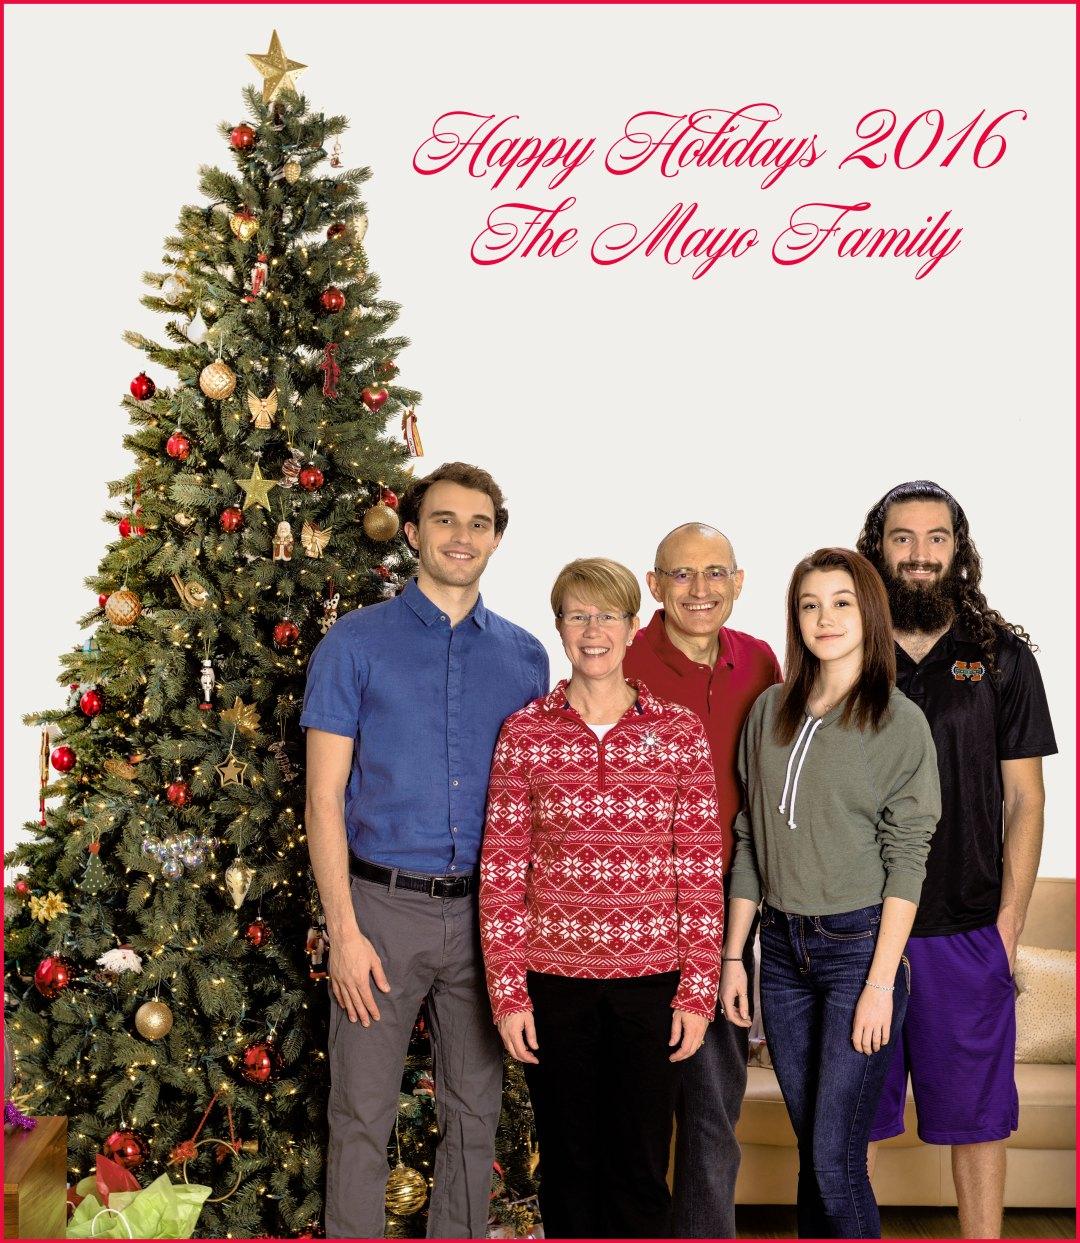 xmas-2016-family-portraits-4252-pccomplete-psedit